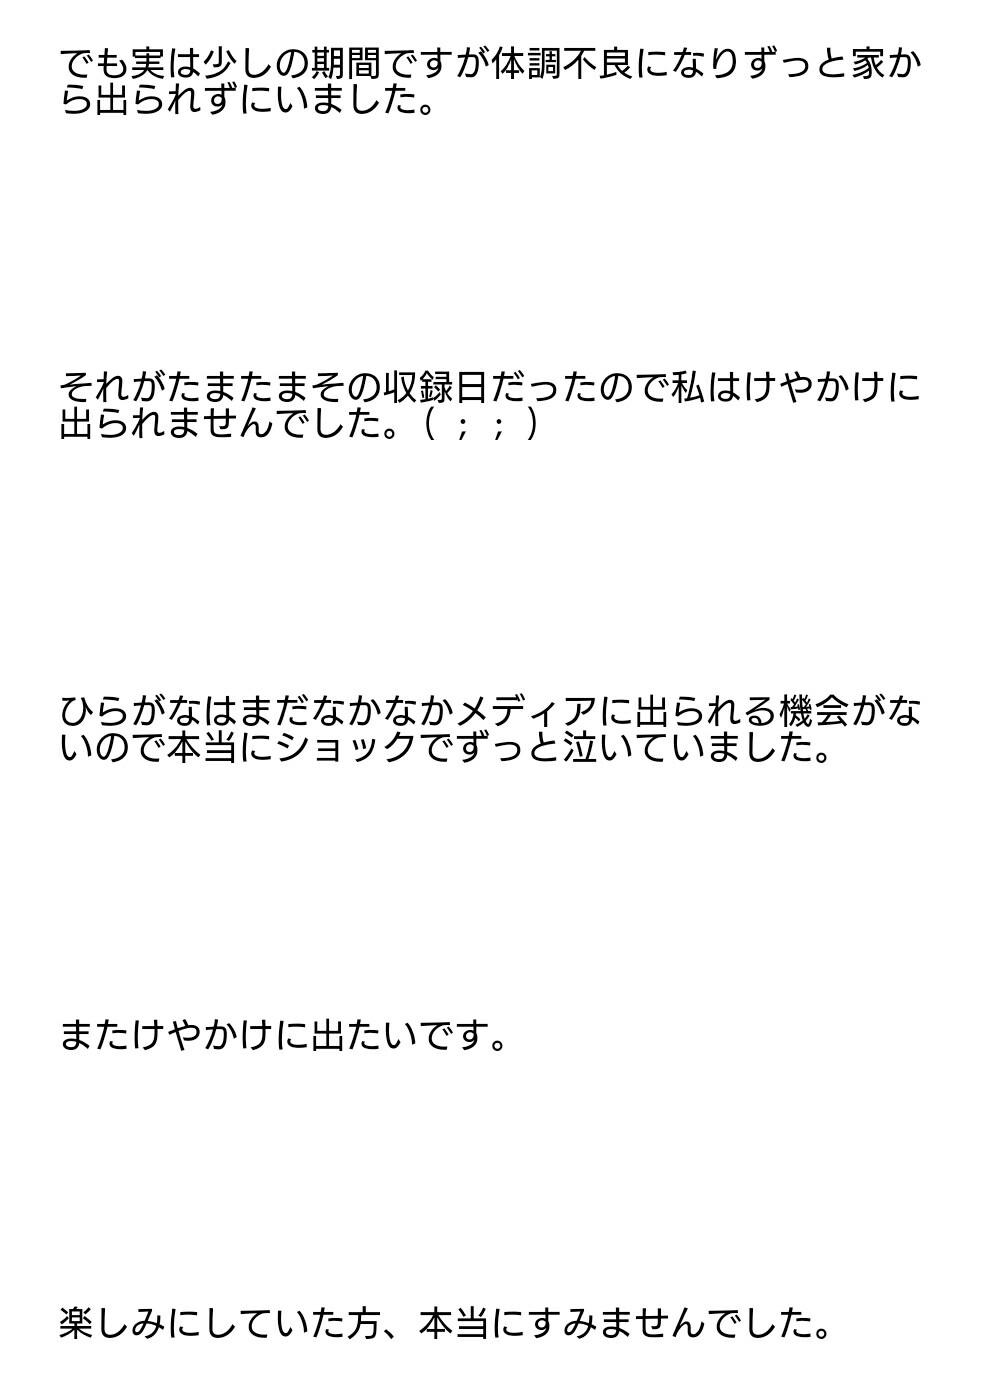 f:id:asitaha46:20170328063542j:image